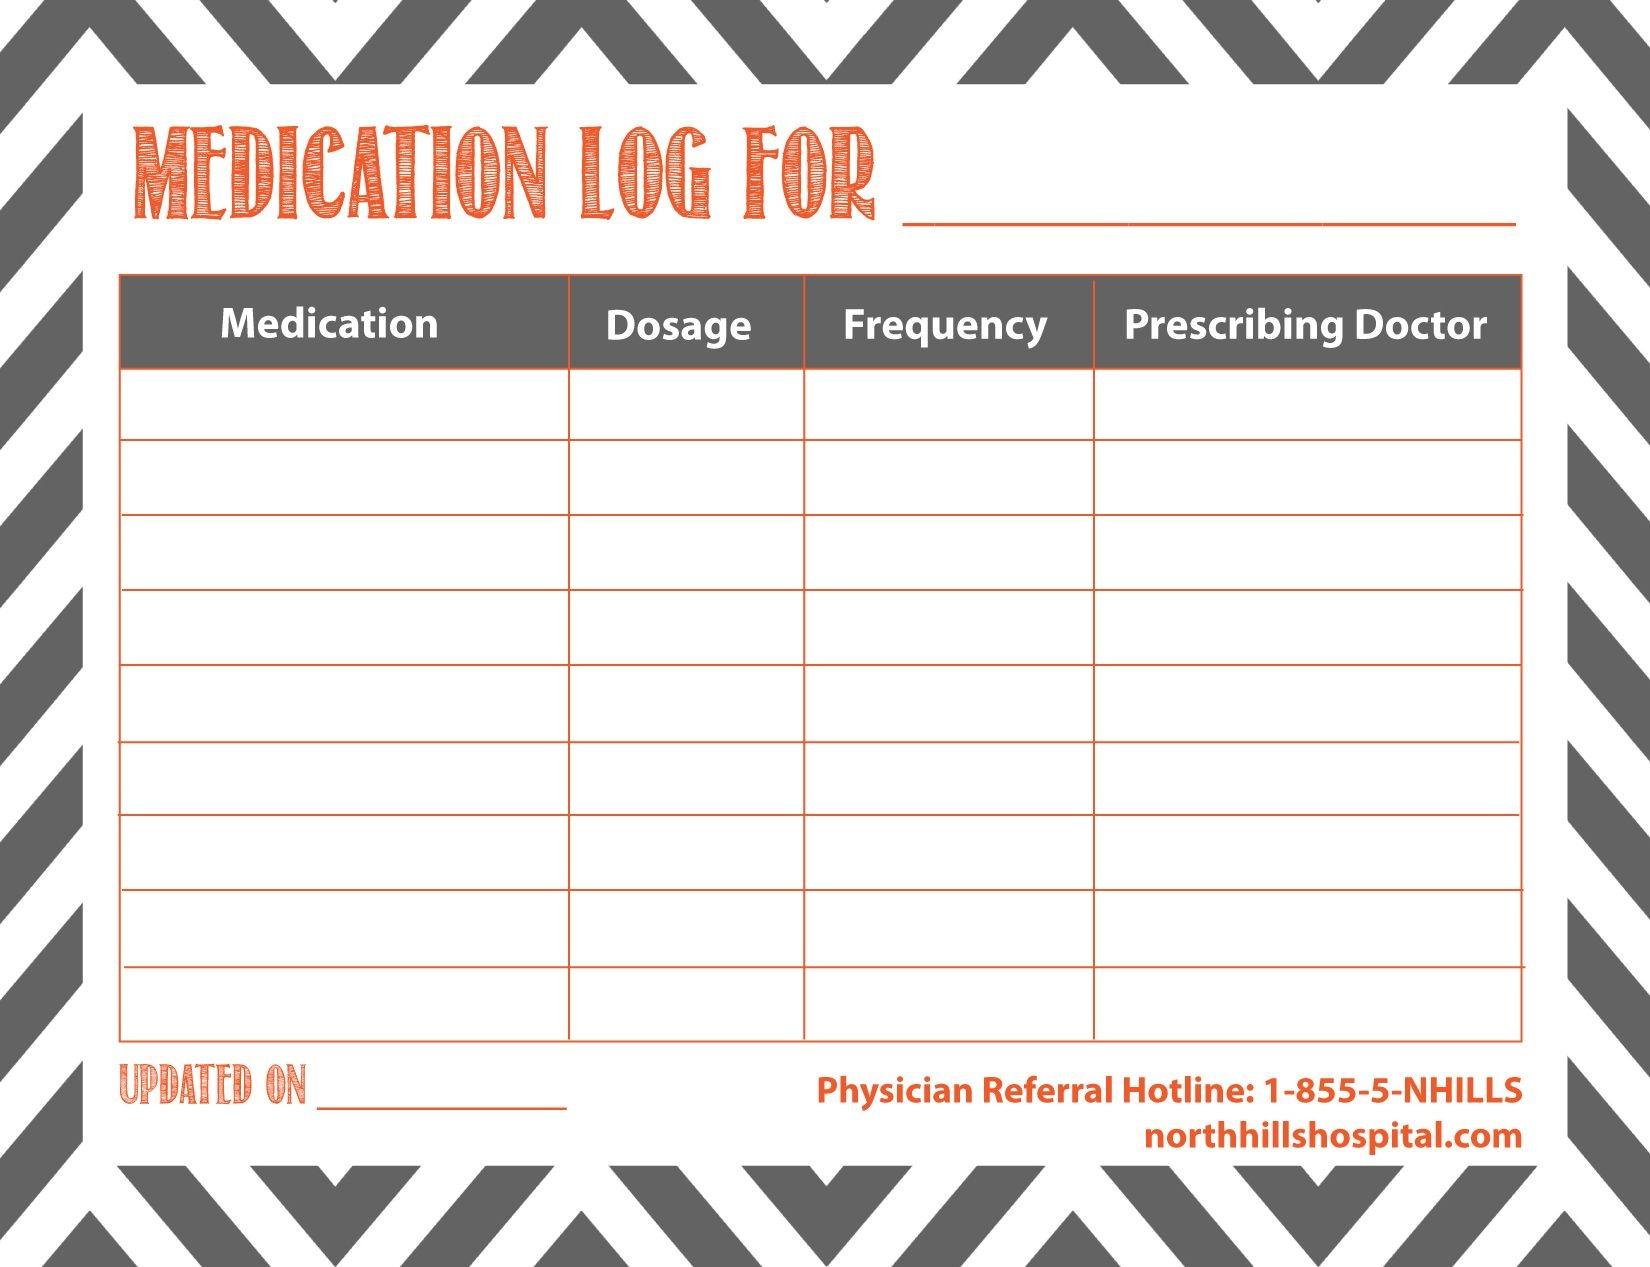 Free Printable: Medication Log   Planner Ideas & Printables - Free Printable Medication Log